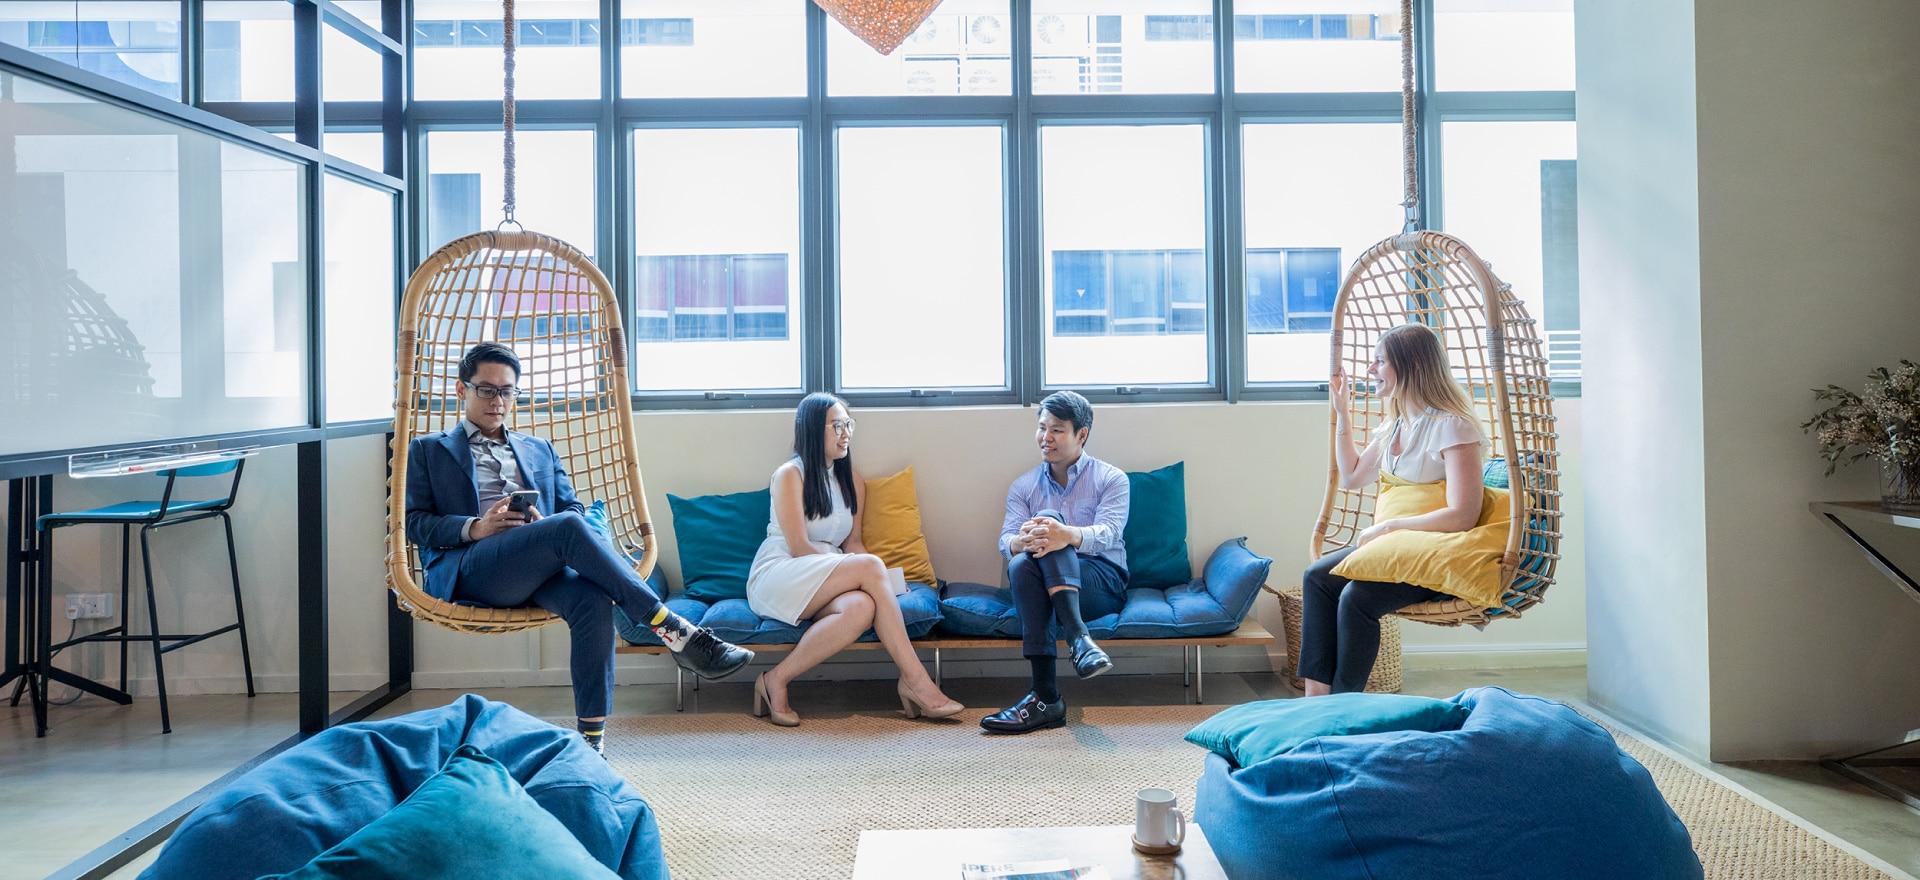 People sitting in communal space